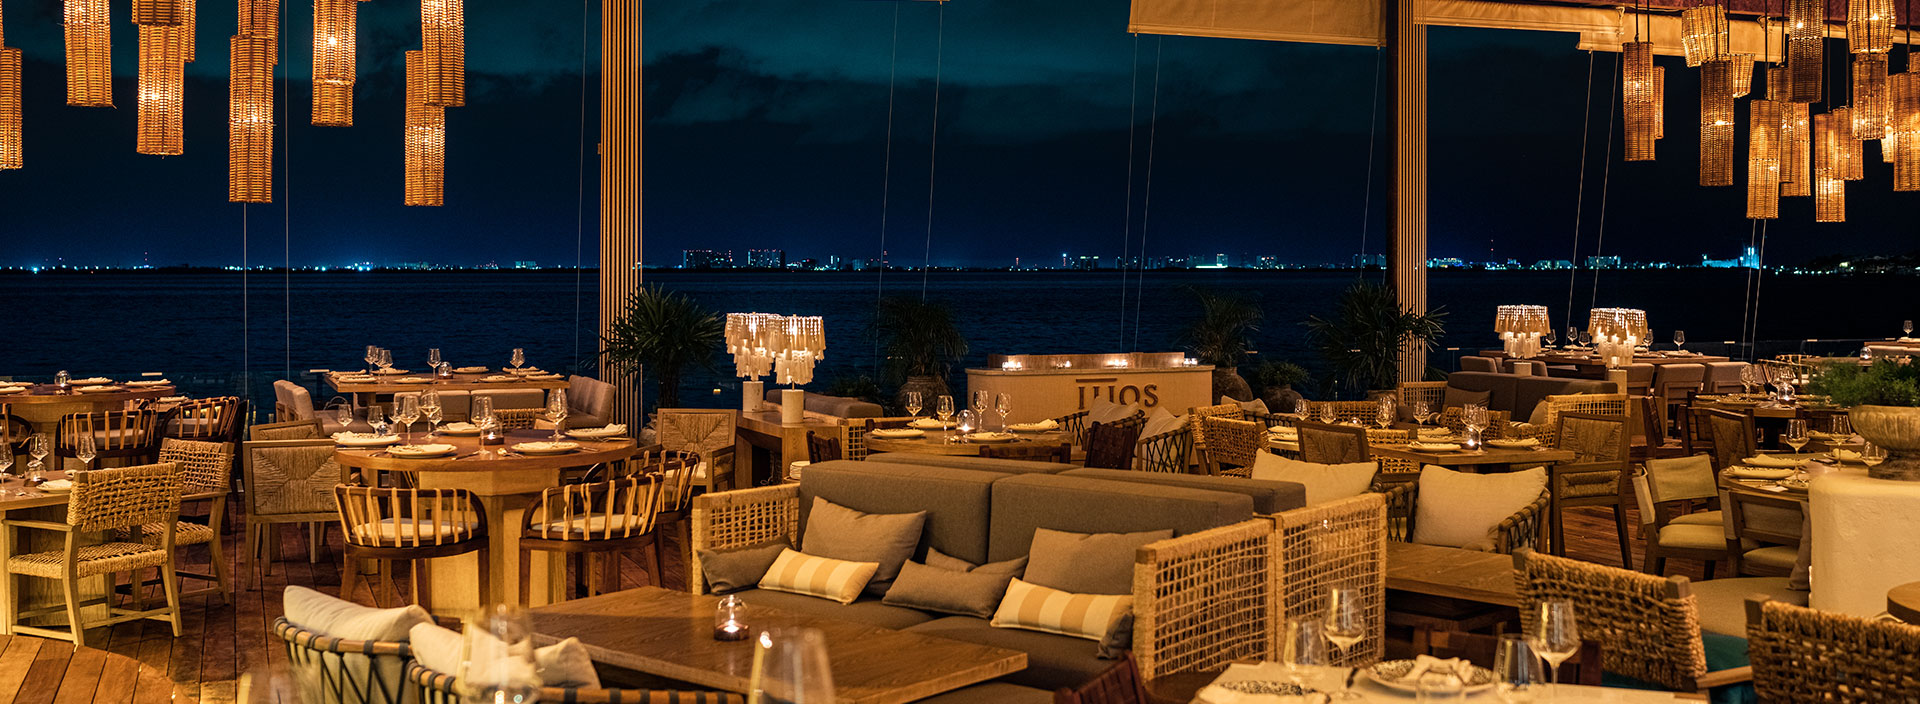 Ilios Restaurant Greek Cancun